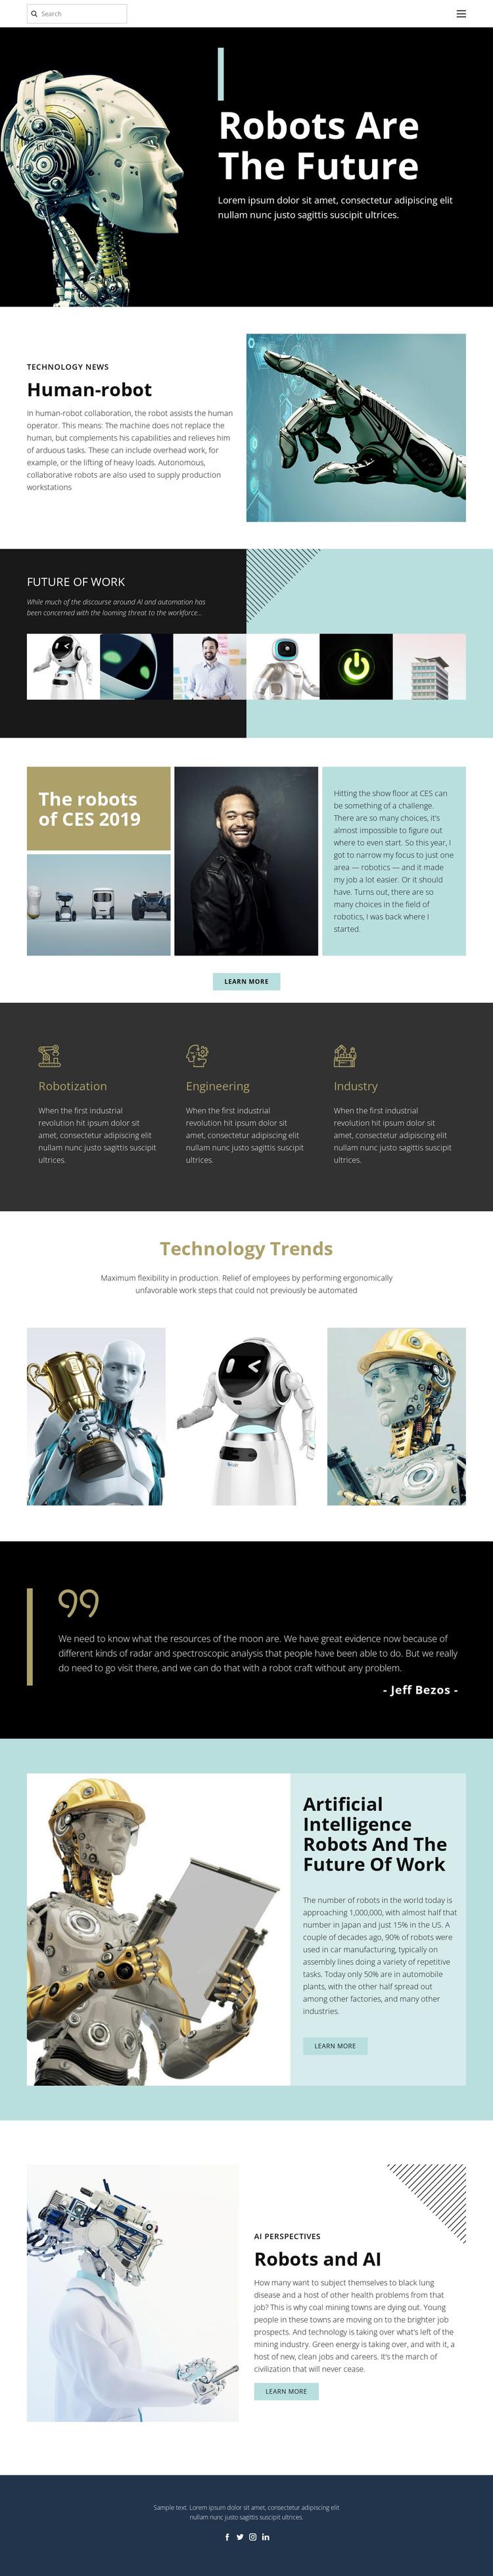 Already future technology Web Design